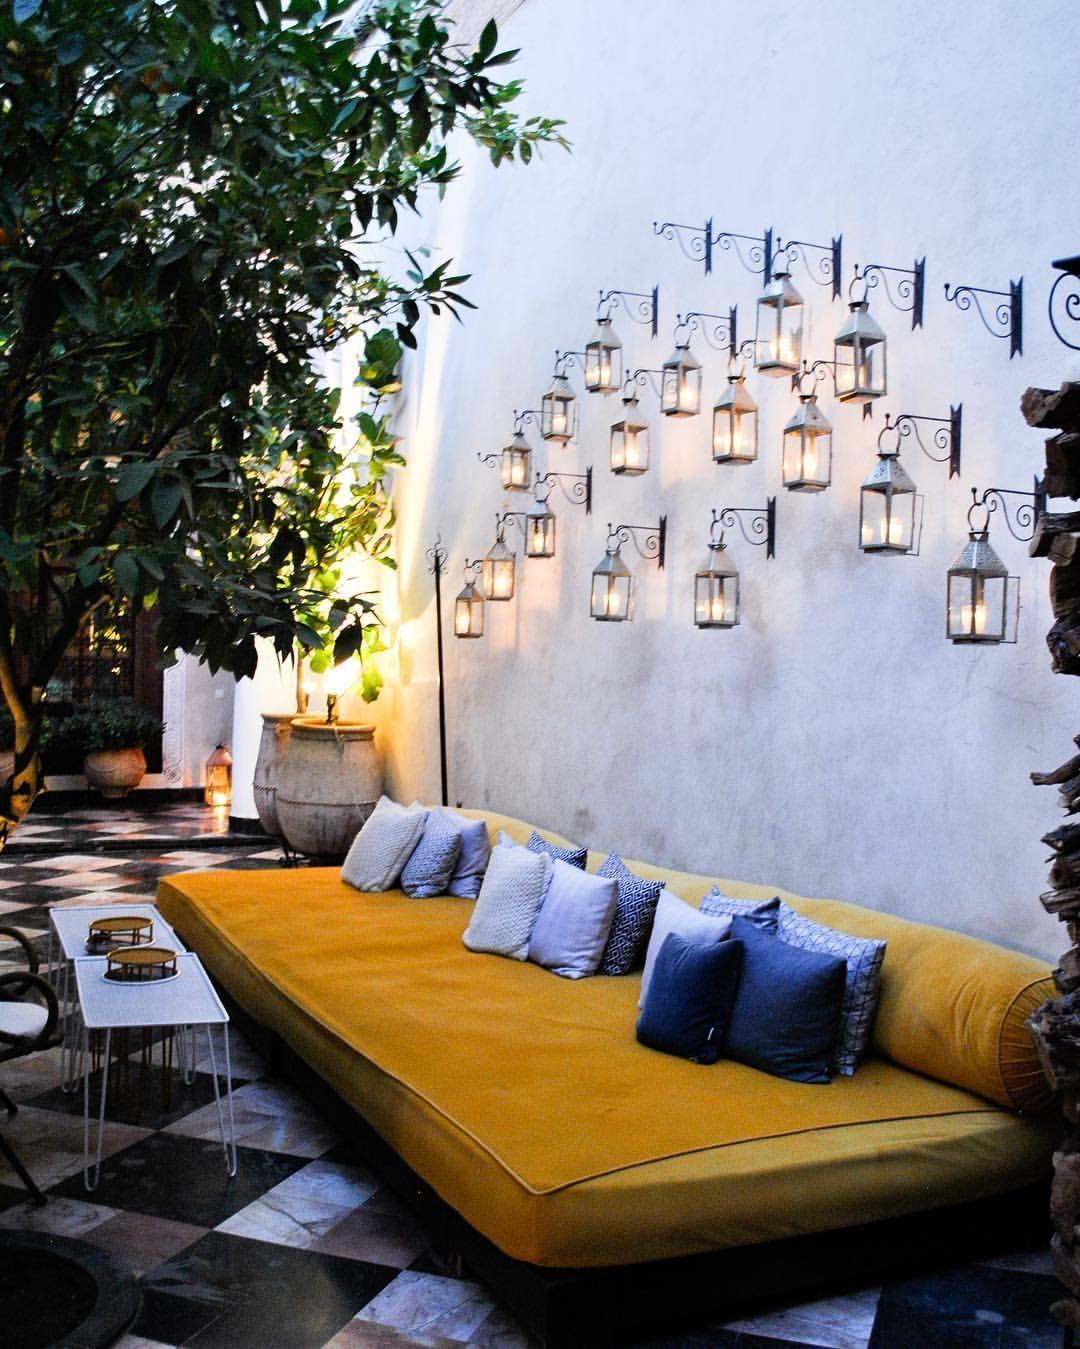 Pin by sarahj on sofa lust in pinterest garden outdoor